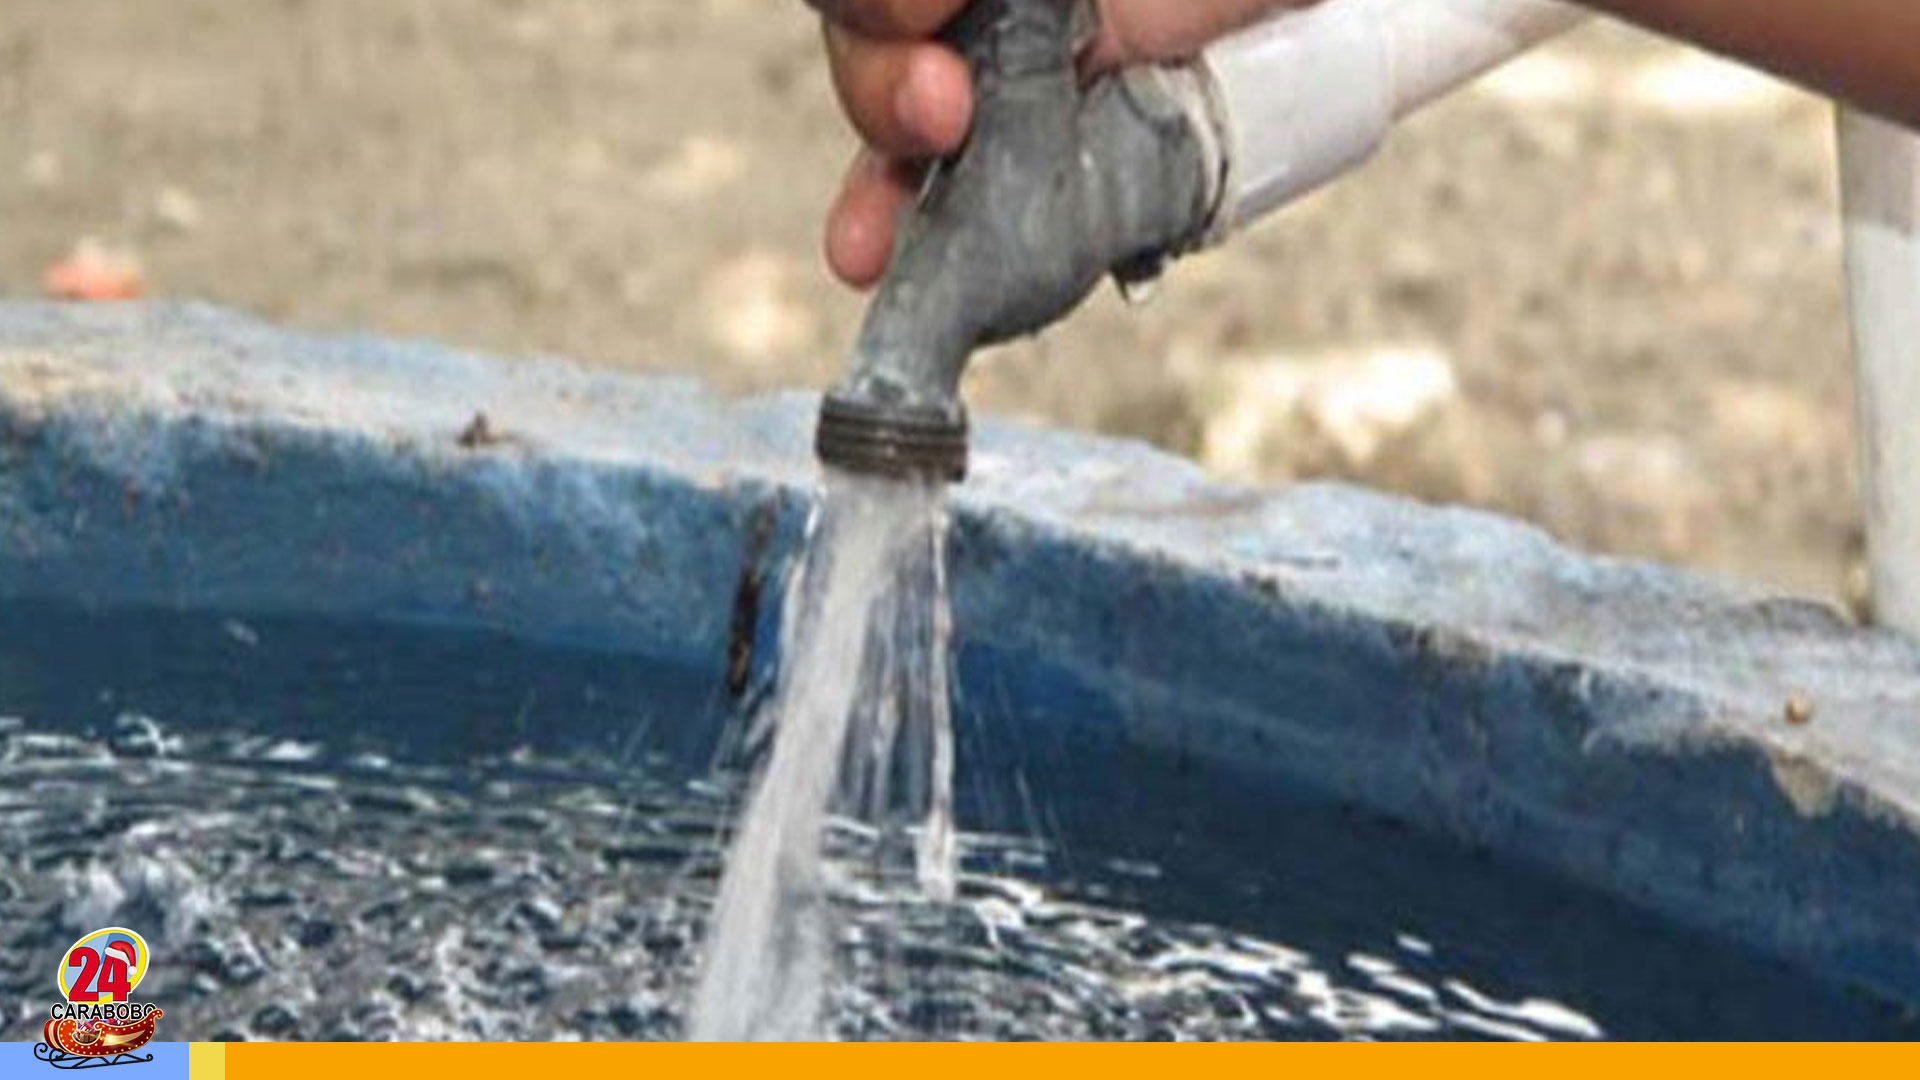 obras de aguas blancas - obras de aguas blancas